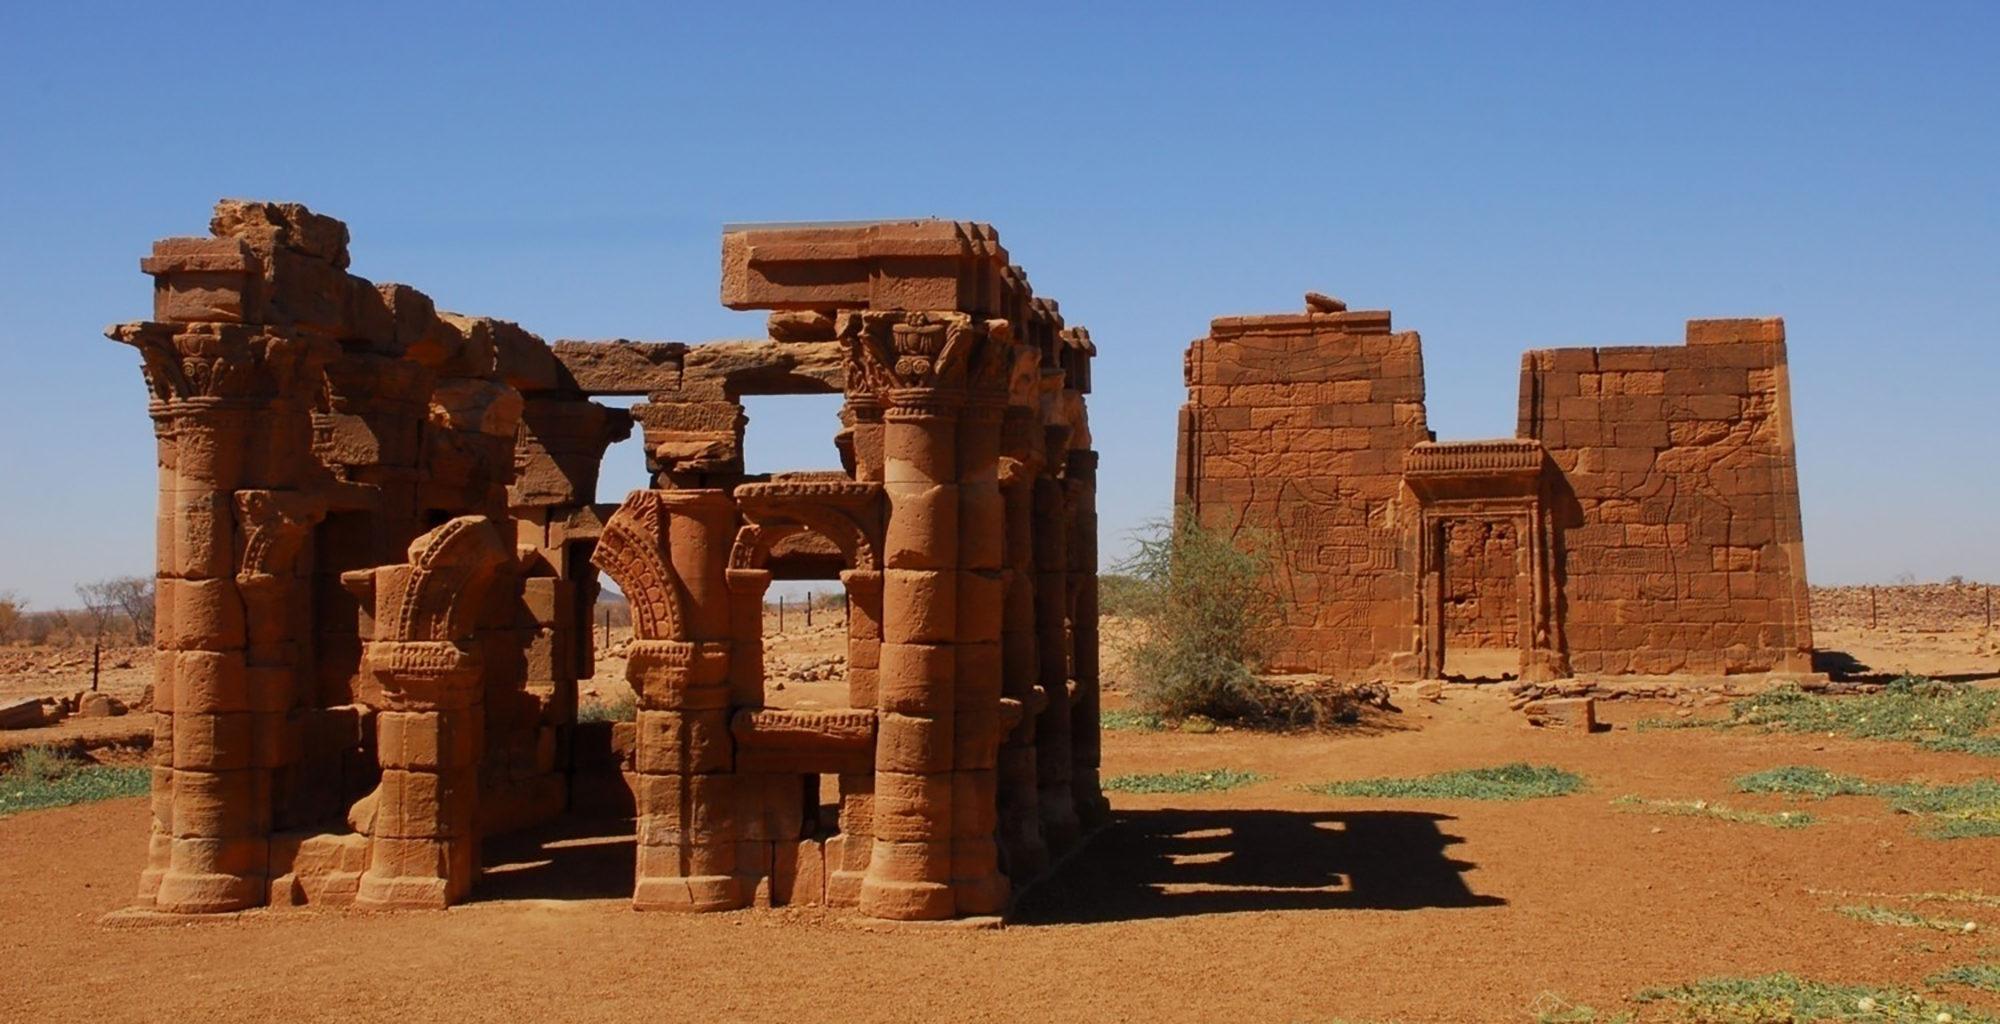 Sudan-Musawwarat-Architecture